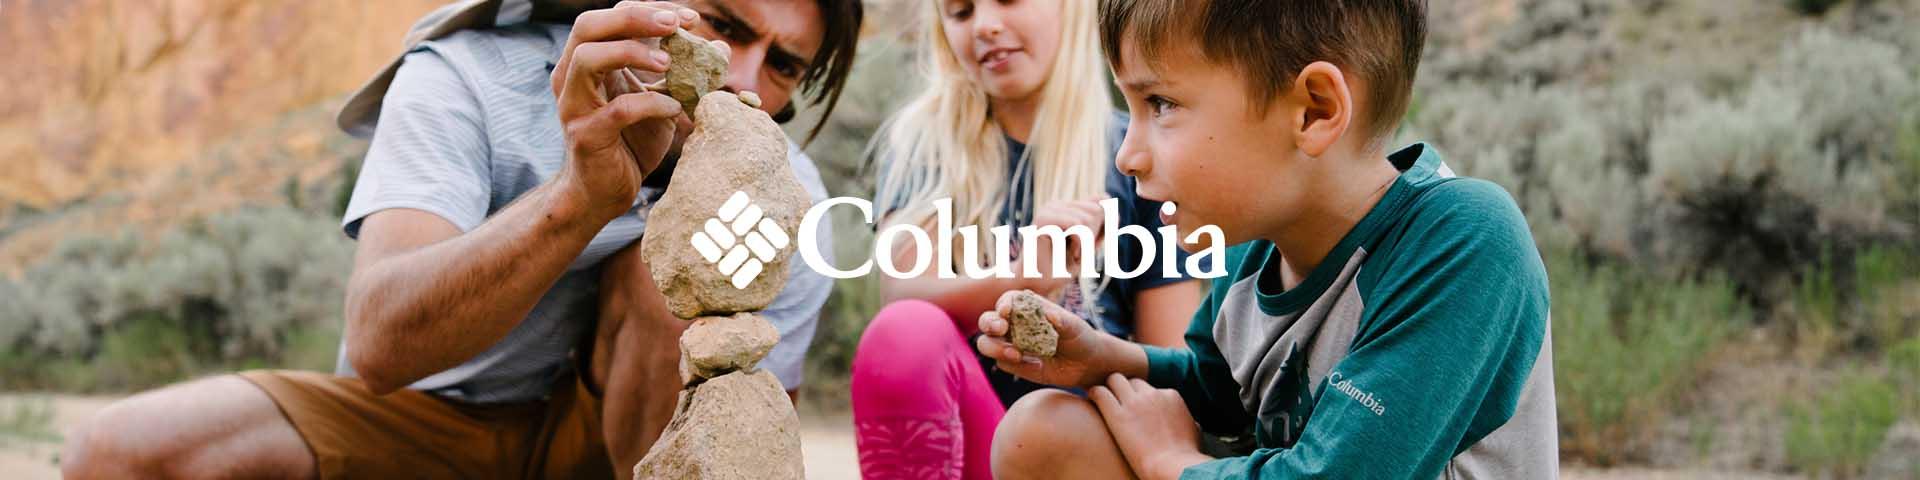 gran selección gran descuento diseño superior Ropa y calzado deportivo Columbia de niño | Catálogo ...